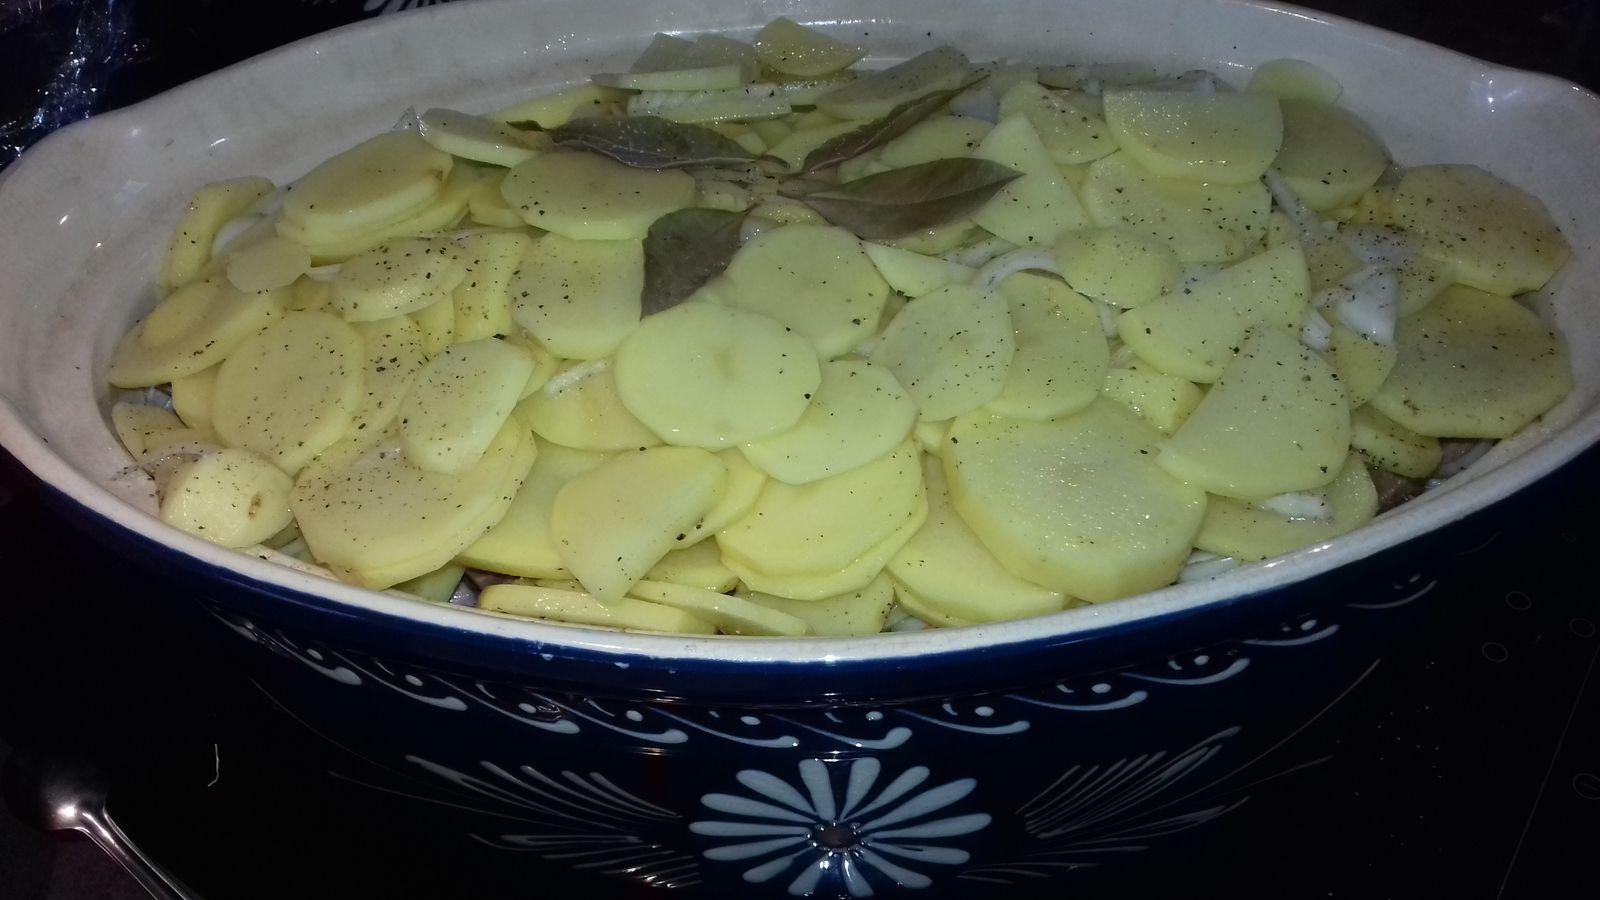 Baeckeaoffe-Bäckeoffe-Bäckaofa ou potée boulangère alsacienne